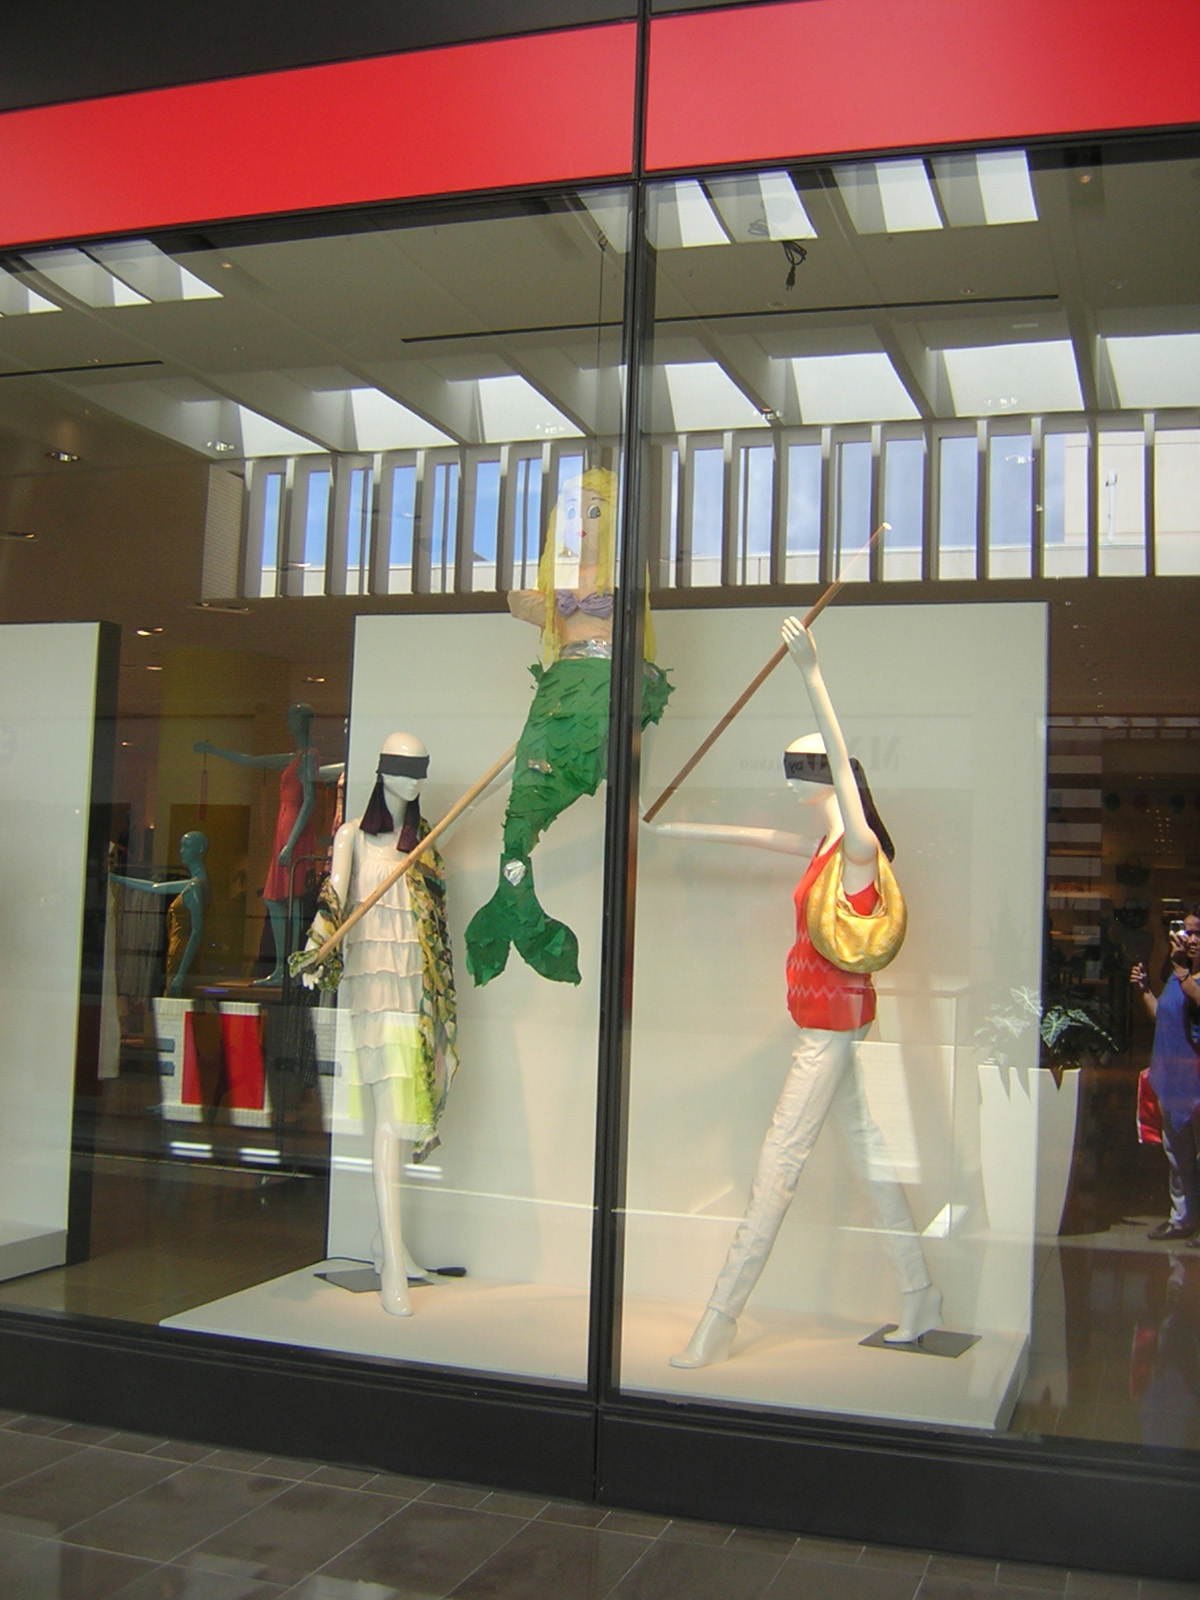 Barney clothing store